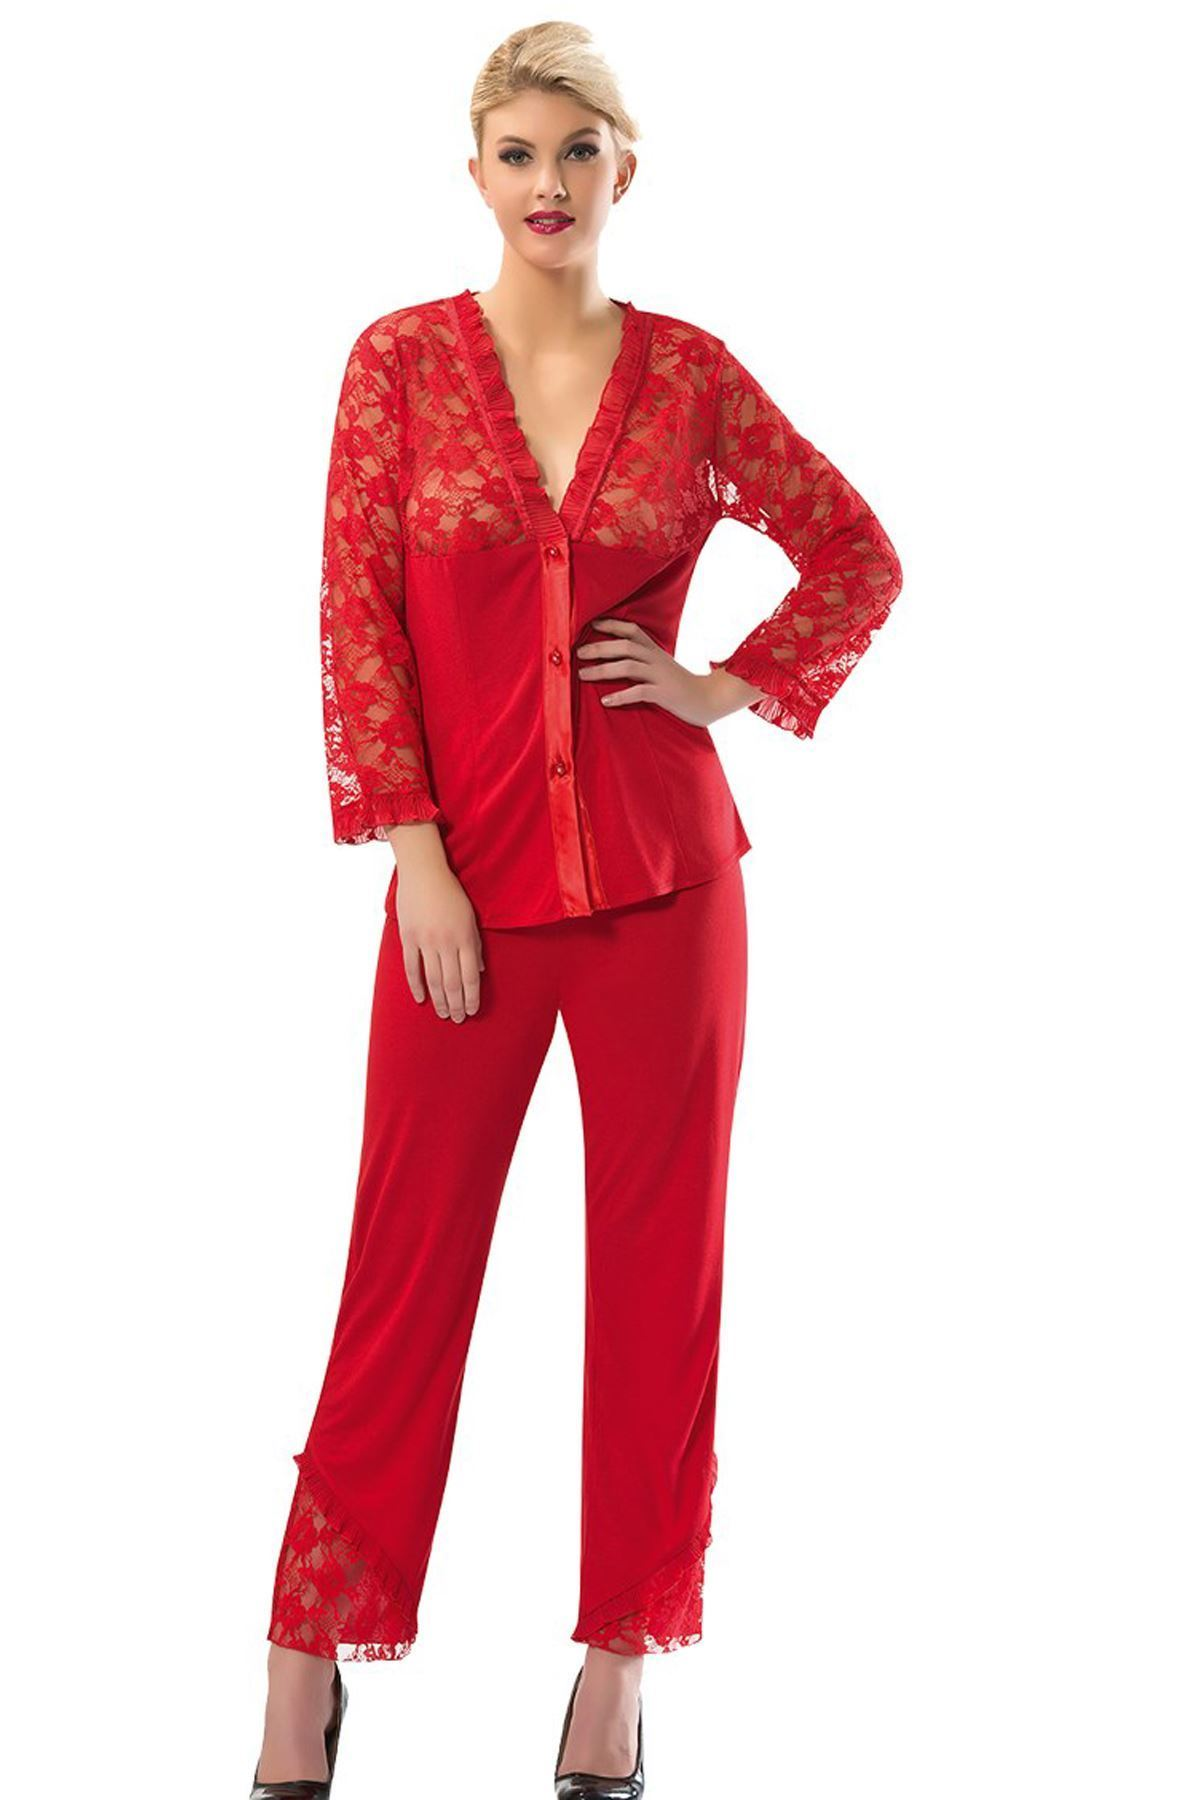 Sistina 1570 penye çeyizlik pijama takım